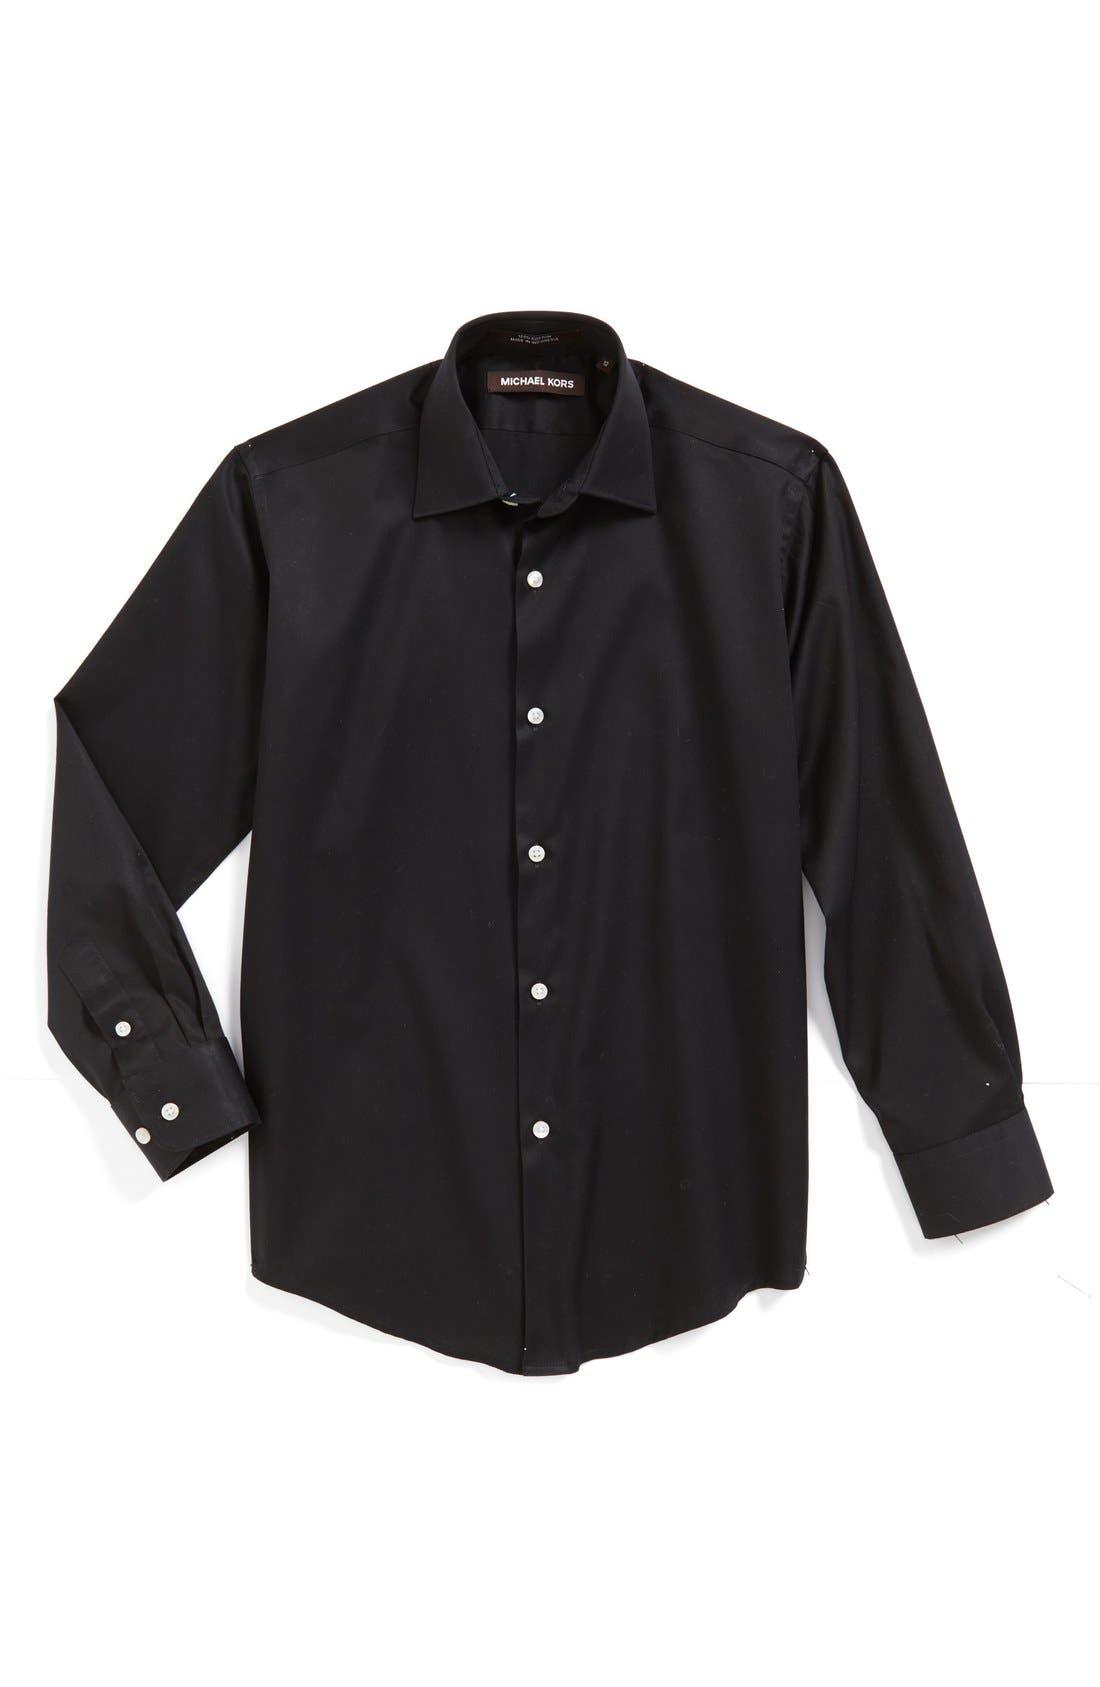 MICHAEL KORS Solid Dress Shirt, Main, color, BLACK